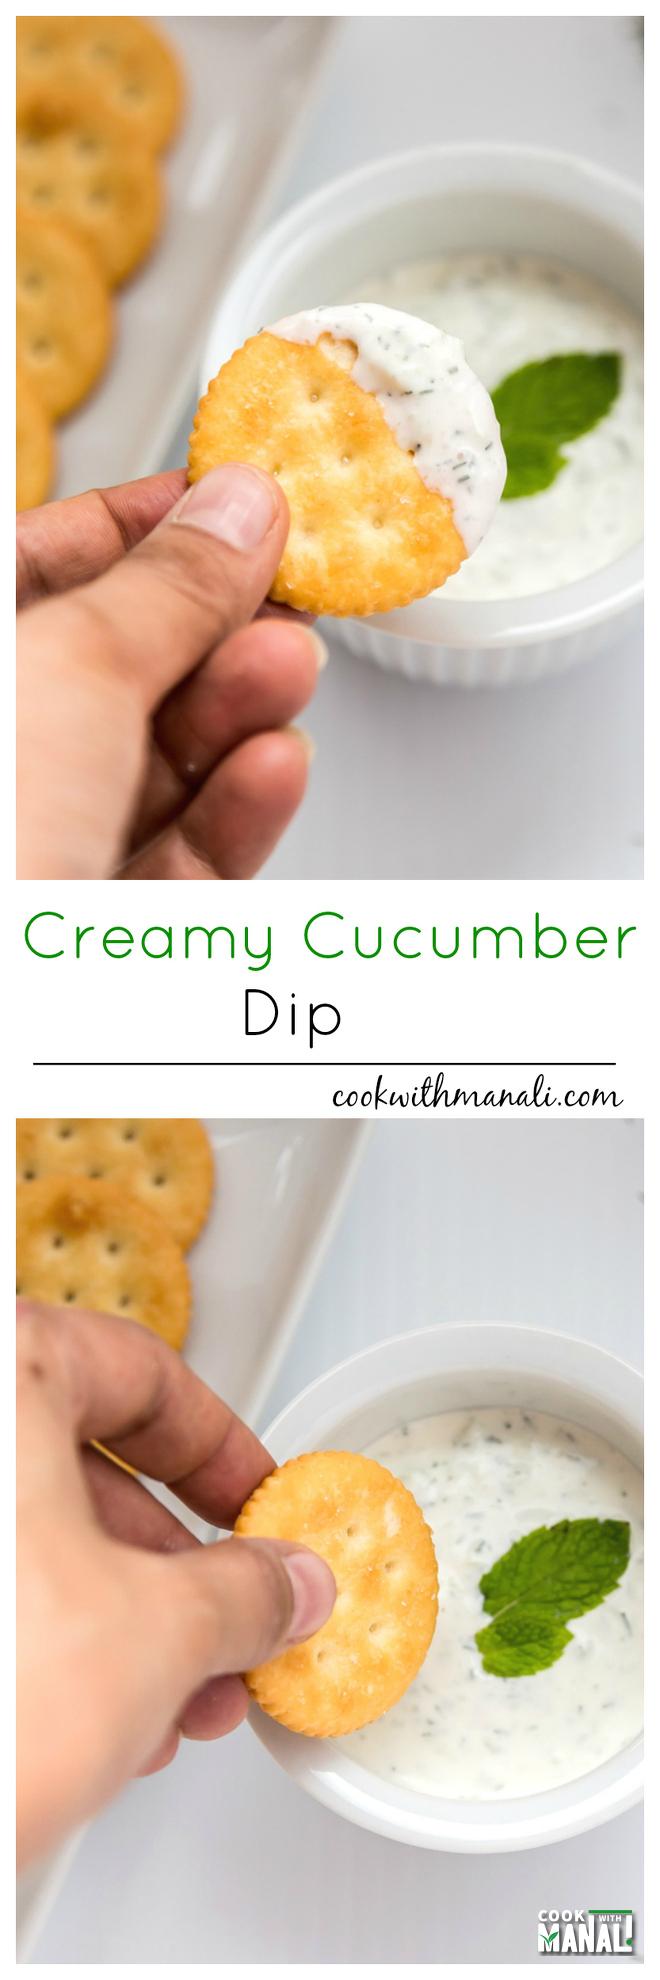 Creamy Cucumber Dip-Collage